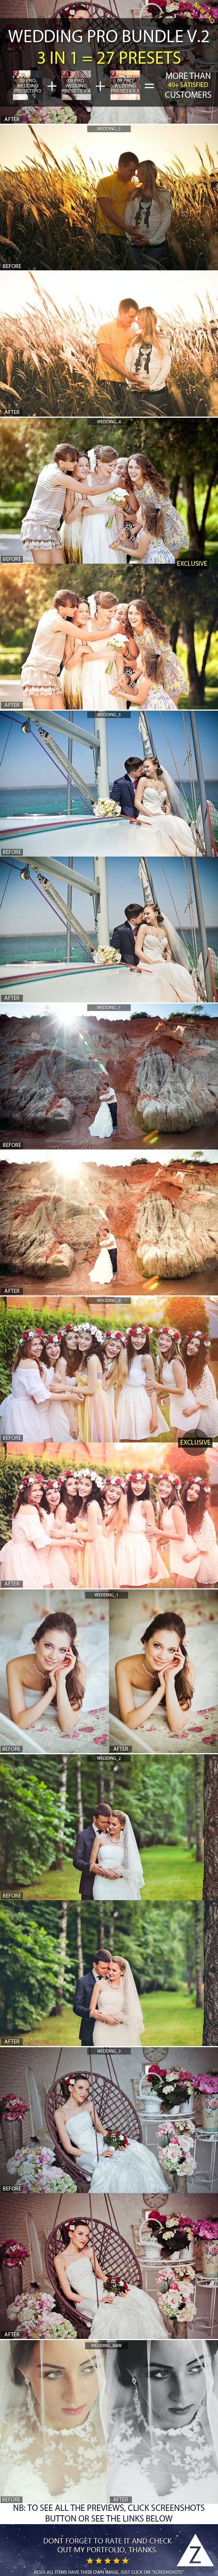 3-in-1 Pro Wedding Bundle vol.2 - Wedding Lightroom Presets